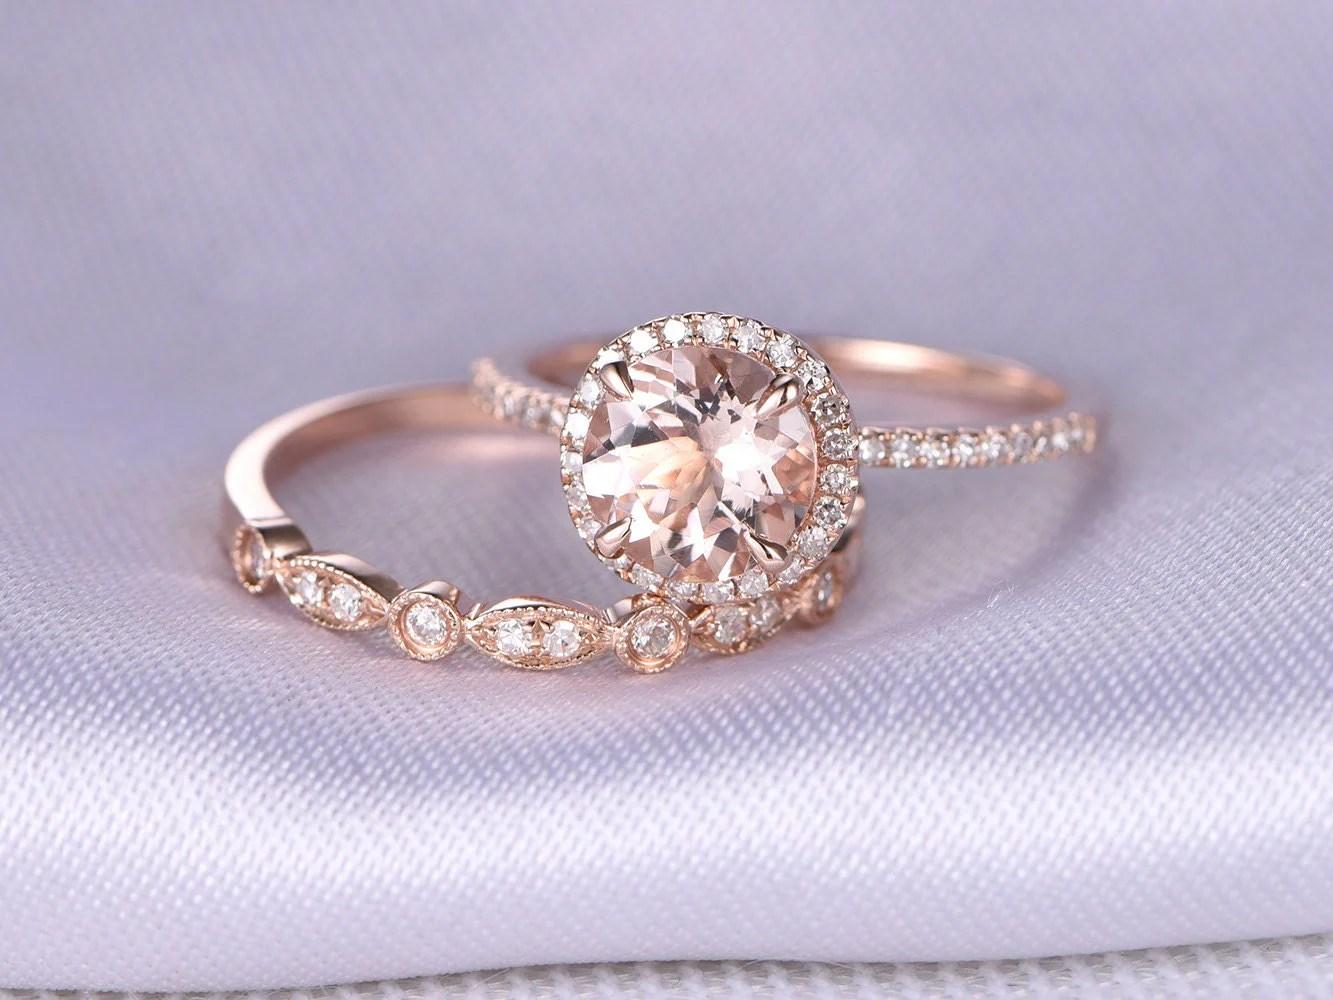 rose gold ring rose gold wedding rings Morganite Engagement ring 2pcs Wedding Ring Set 14k Rose gold Art Deco diamond Matching Band 7mm Round Stone Personalized for her Custom